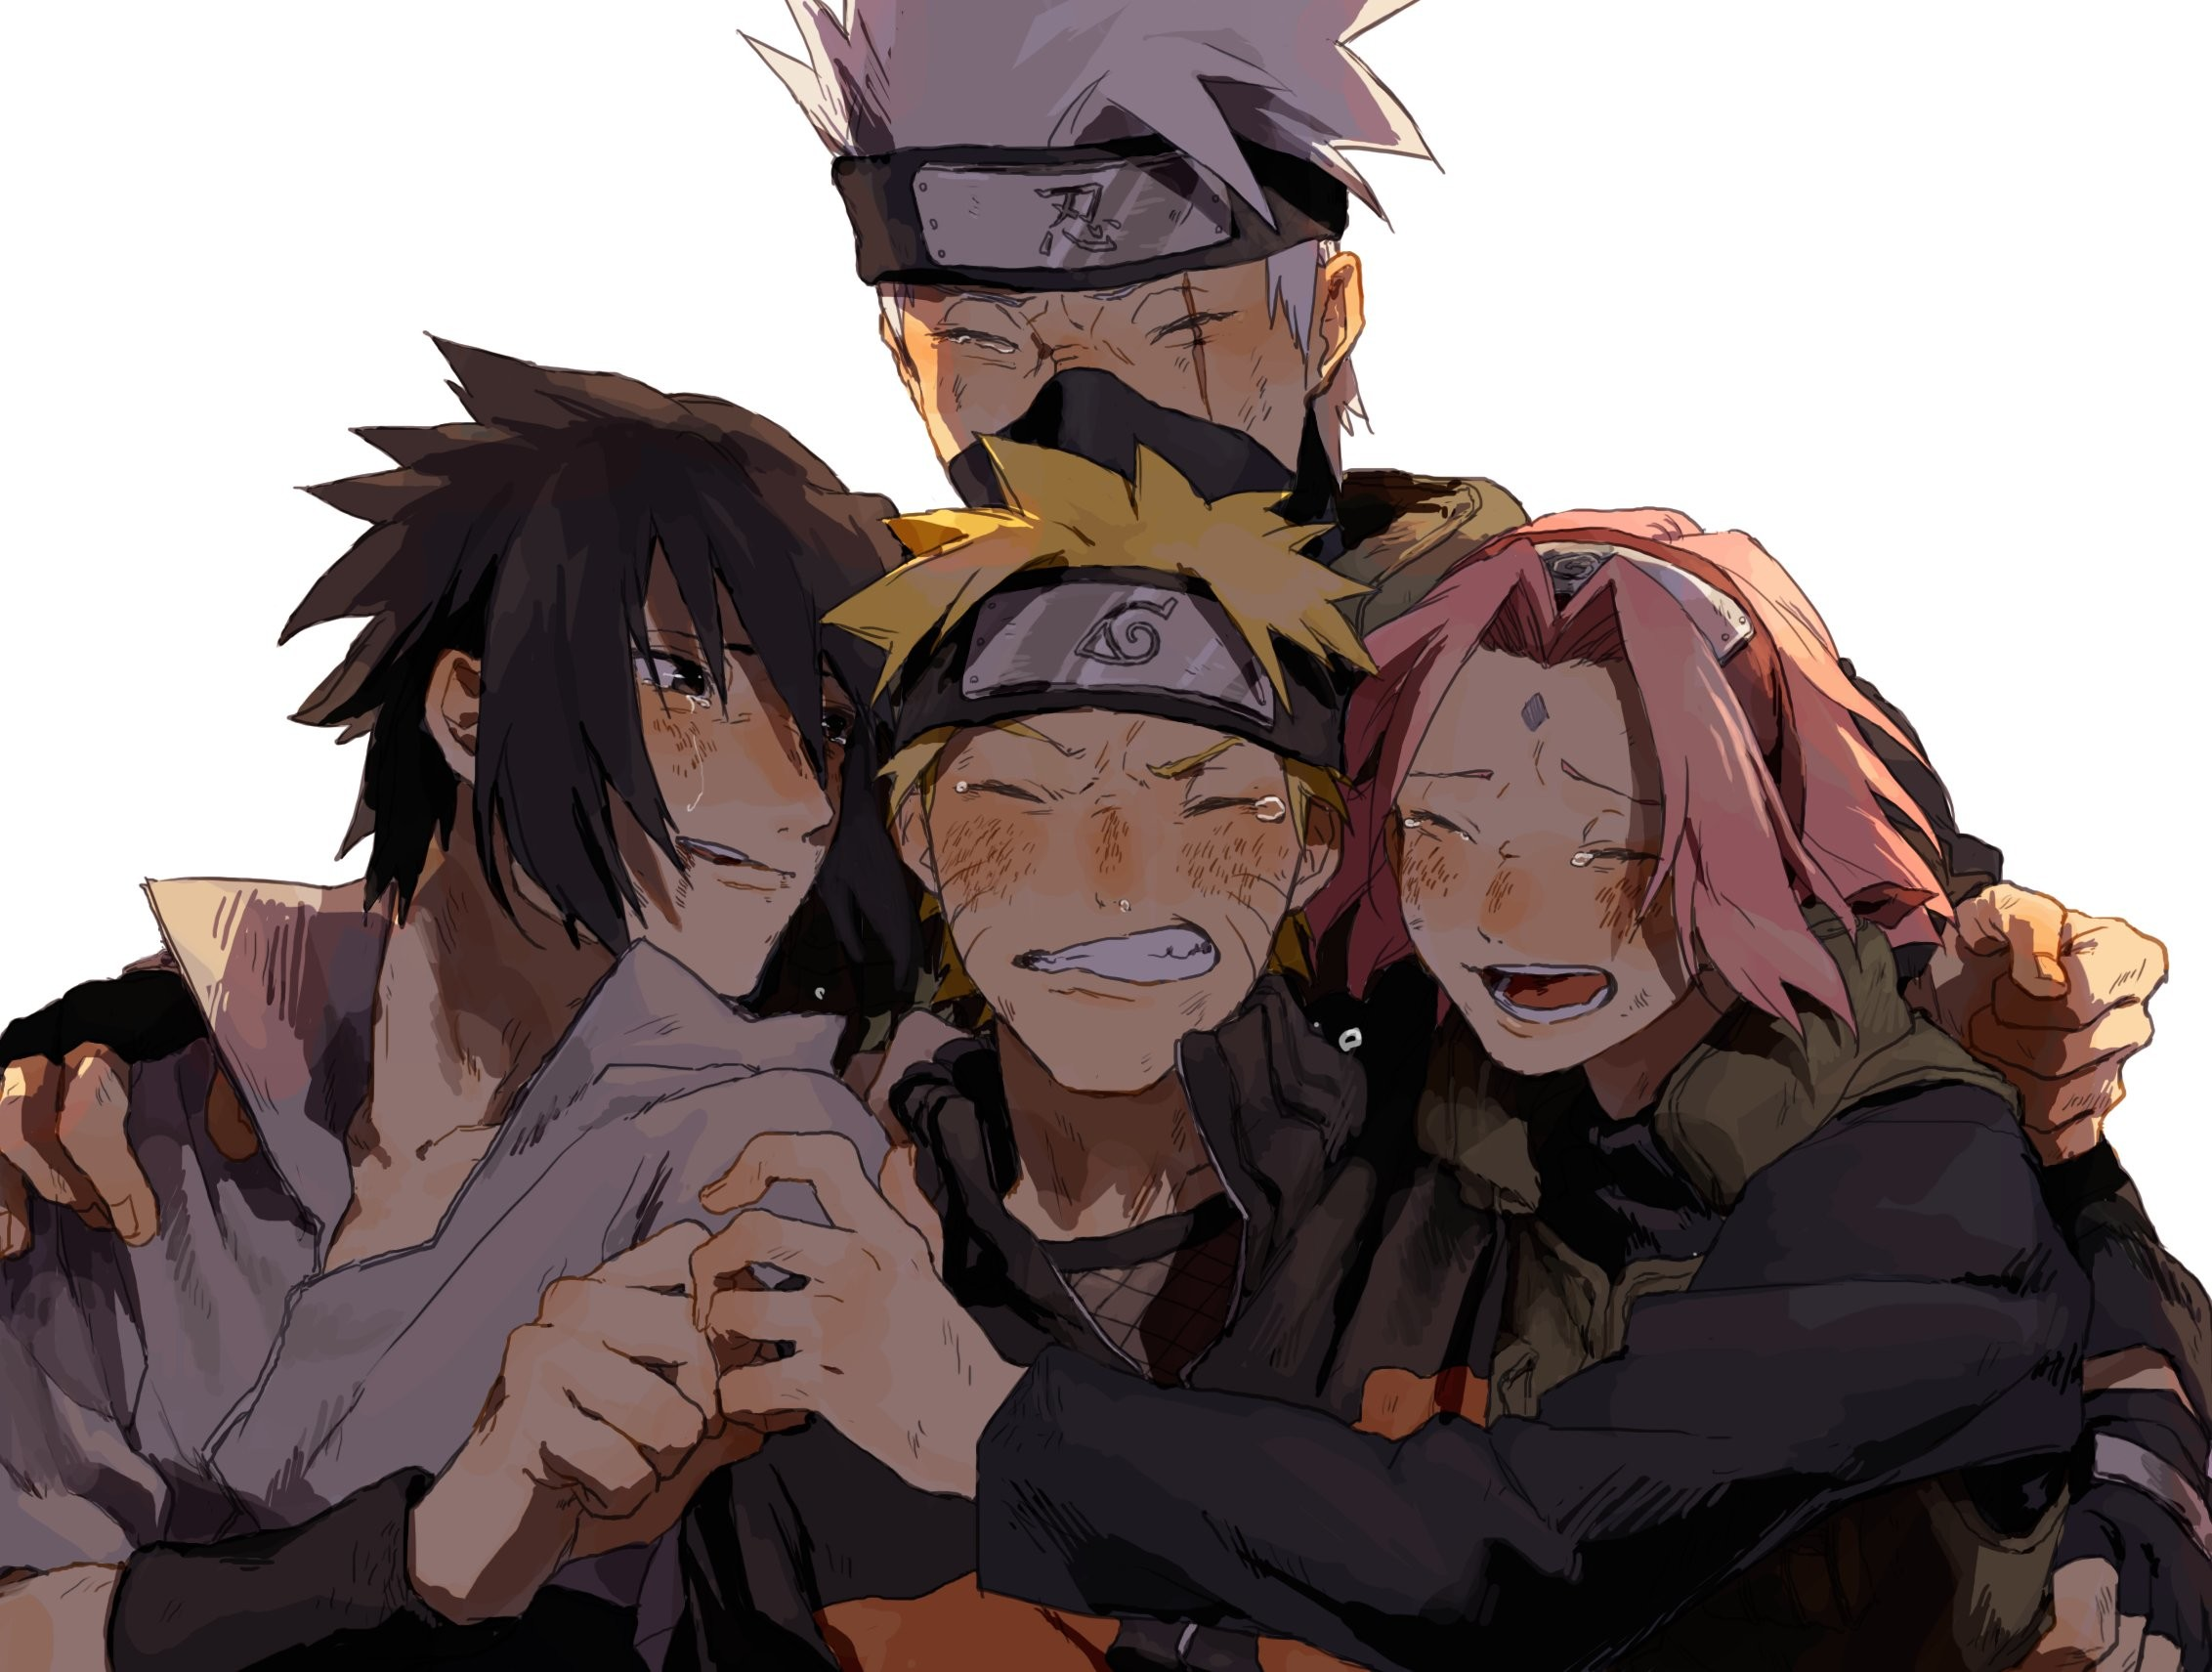 Naruto and Sakura Wallpaper ·① WallpaperTag Naruto And Sakura And Sasuke